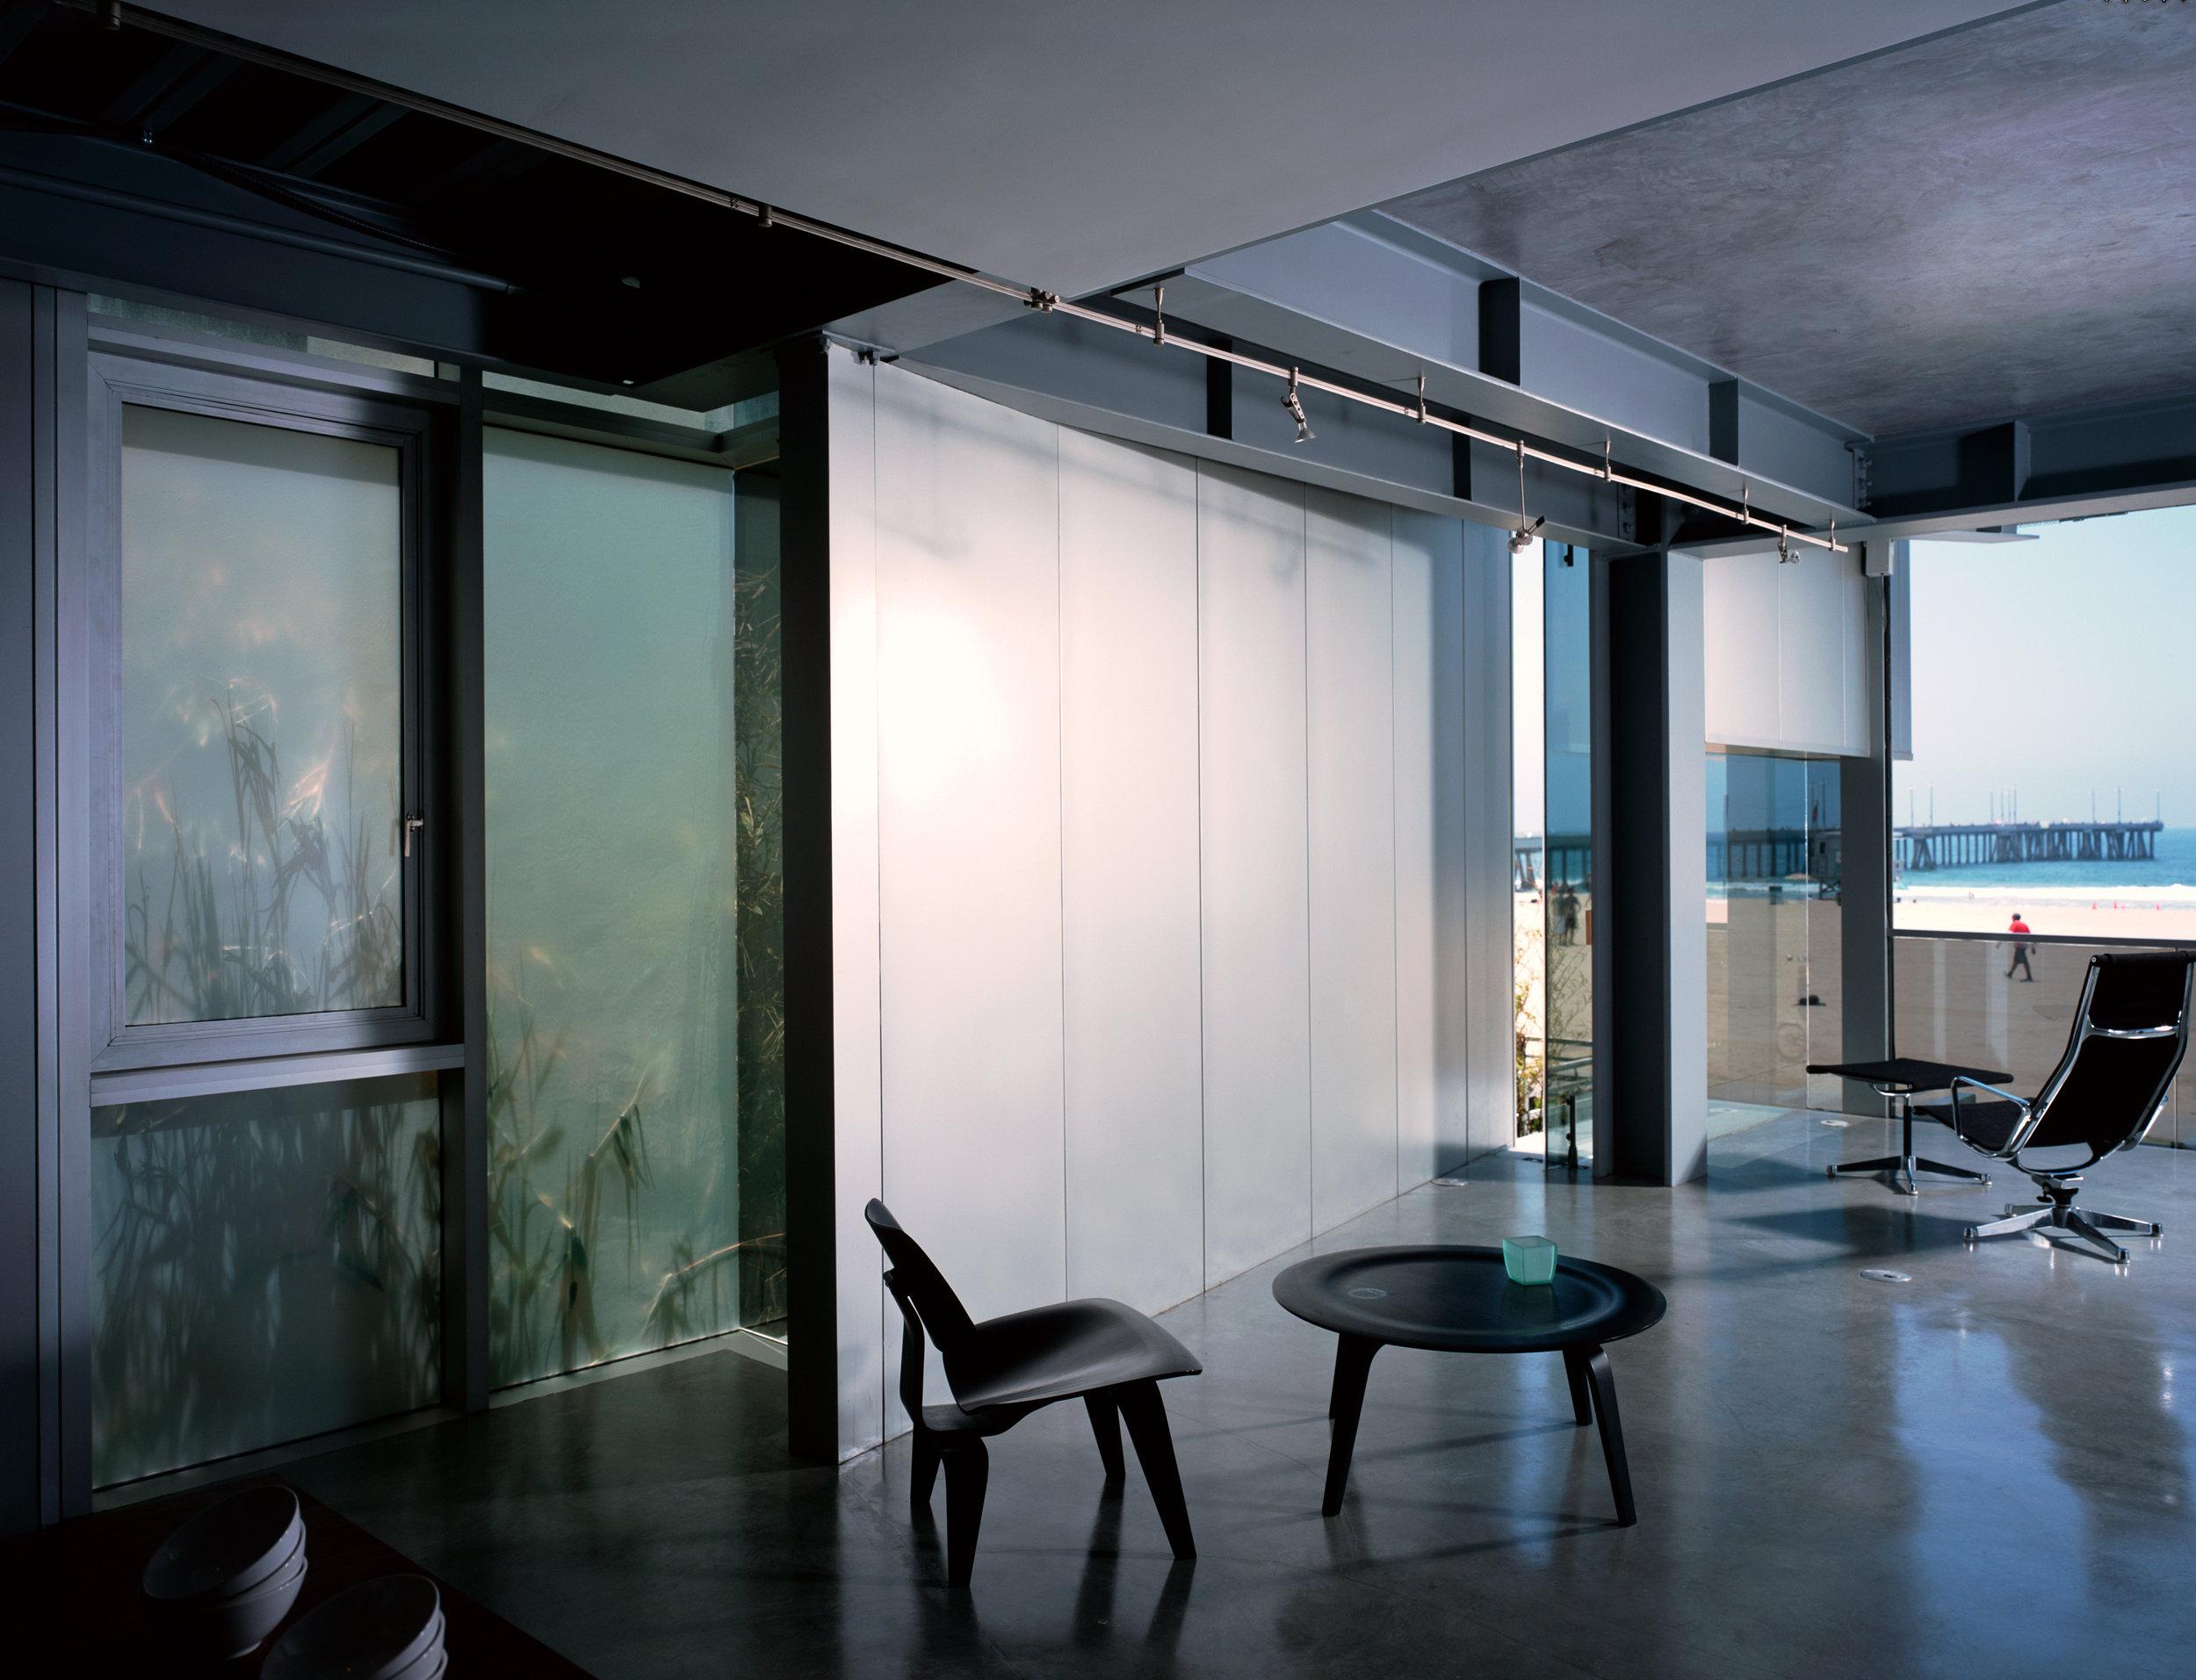 S.E.A.-Studio-Environmental-Architecture-David-Hertz-FAIA-Panel-House-Venice-Beach-California-sustainable-regenerative-restorative-green-design-prefabricated-aluminum-refrigeration-open-concept-ocean-view-residential-glass-steel-sunset-interior-3.jpg